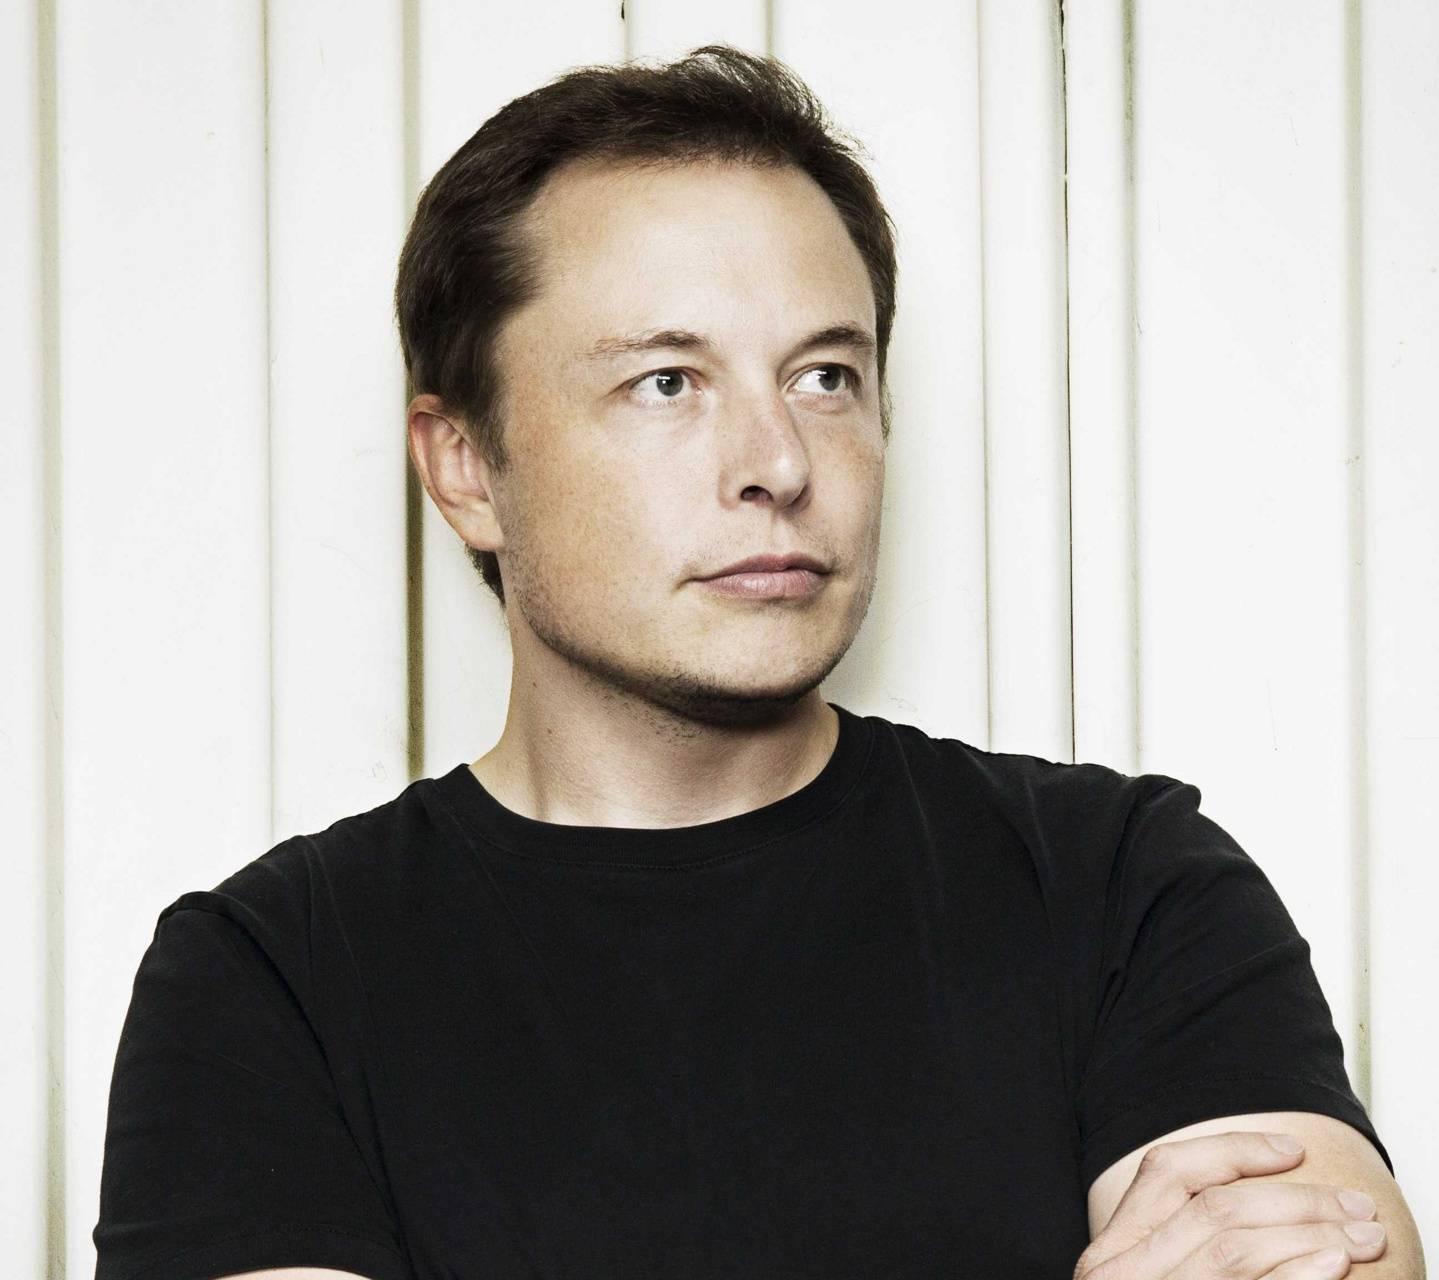 Elon Musk Wallpaper By Andradaanca 56 Free On Zedge